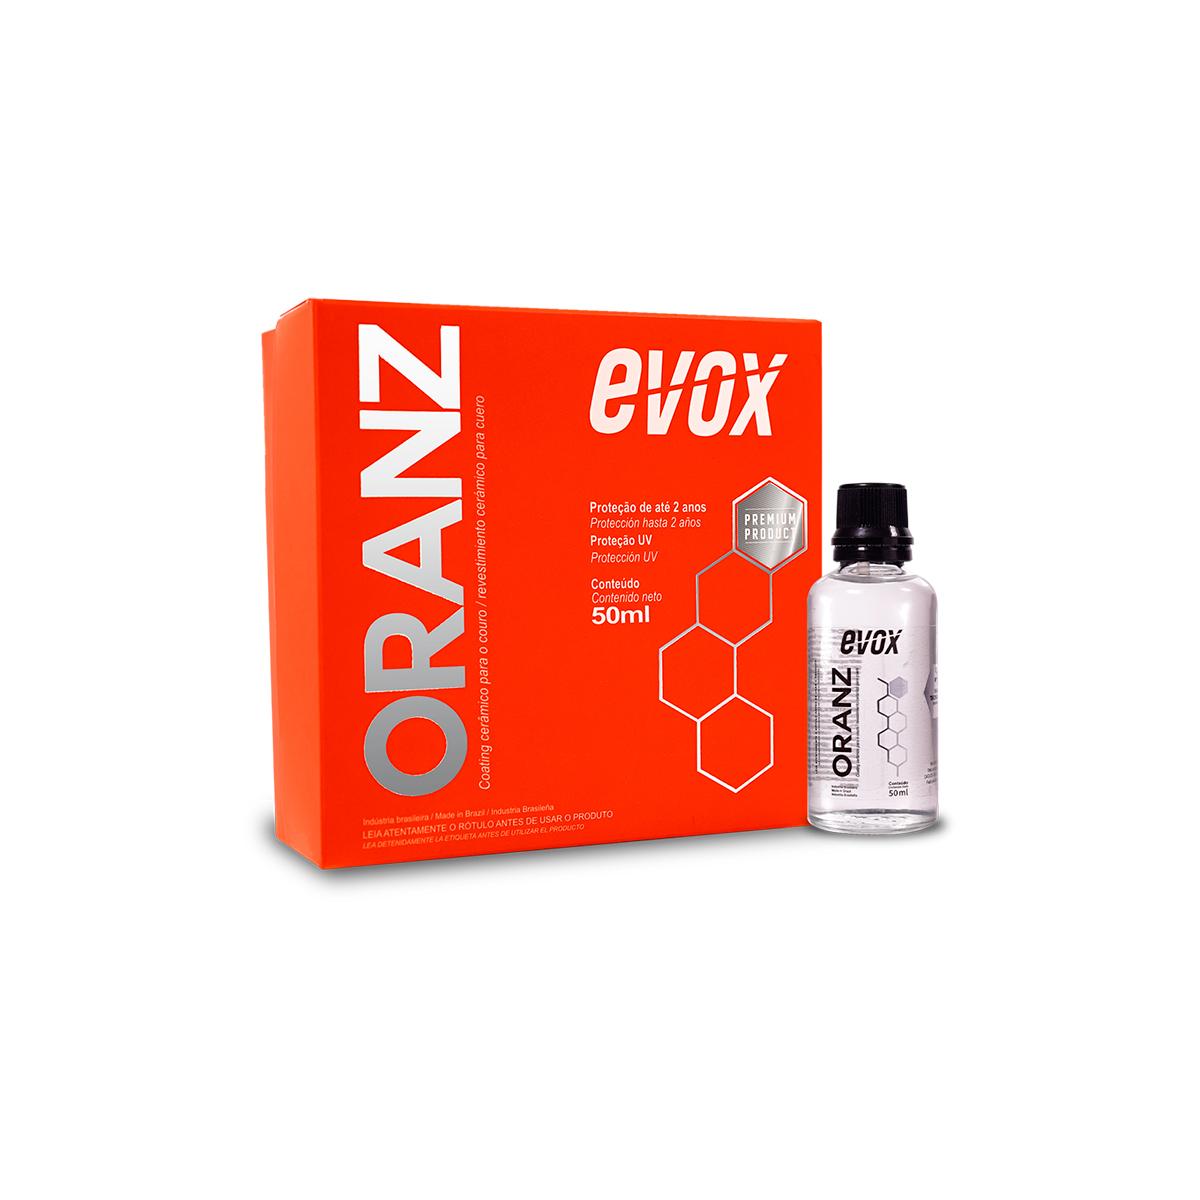 Oranz Ceramic Coating Para Couro 50ml - Evox